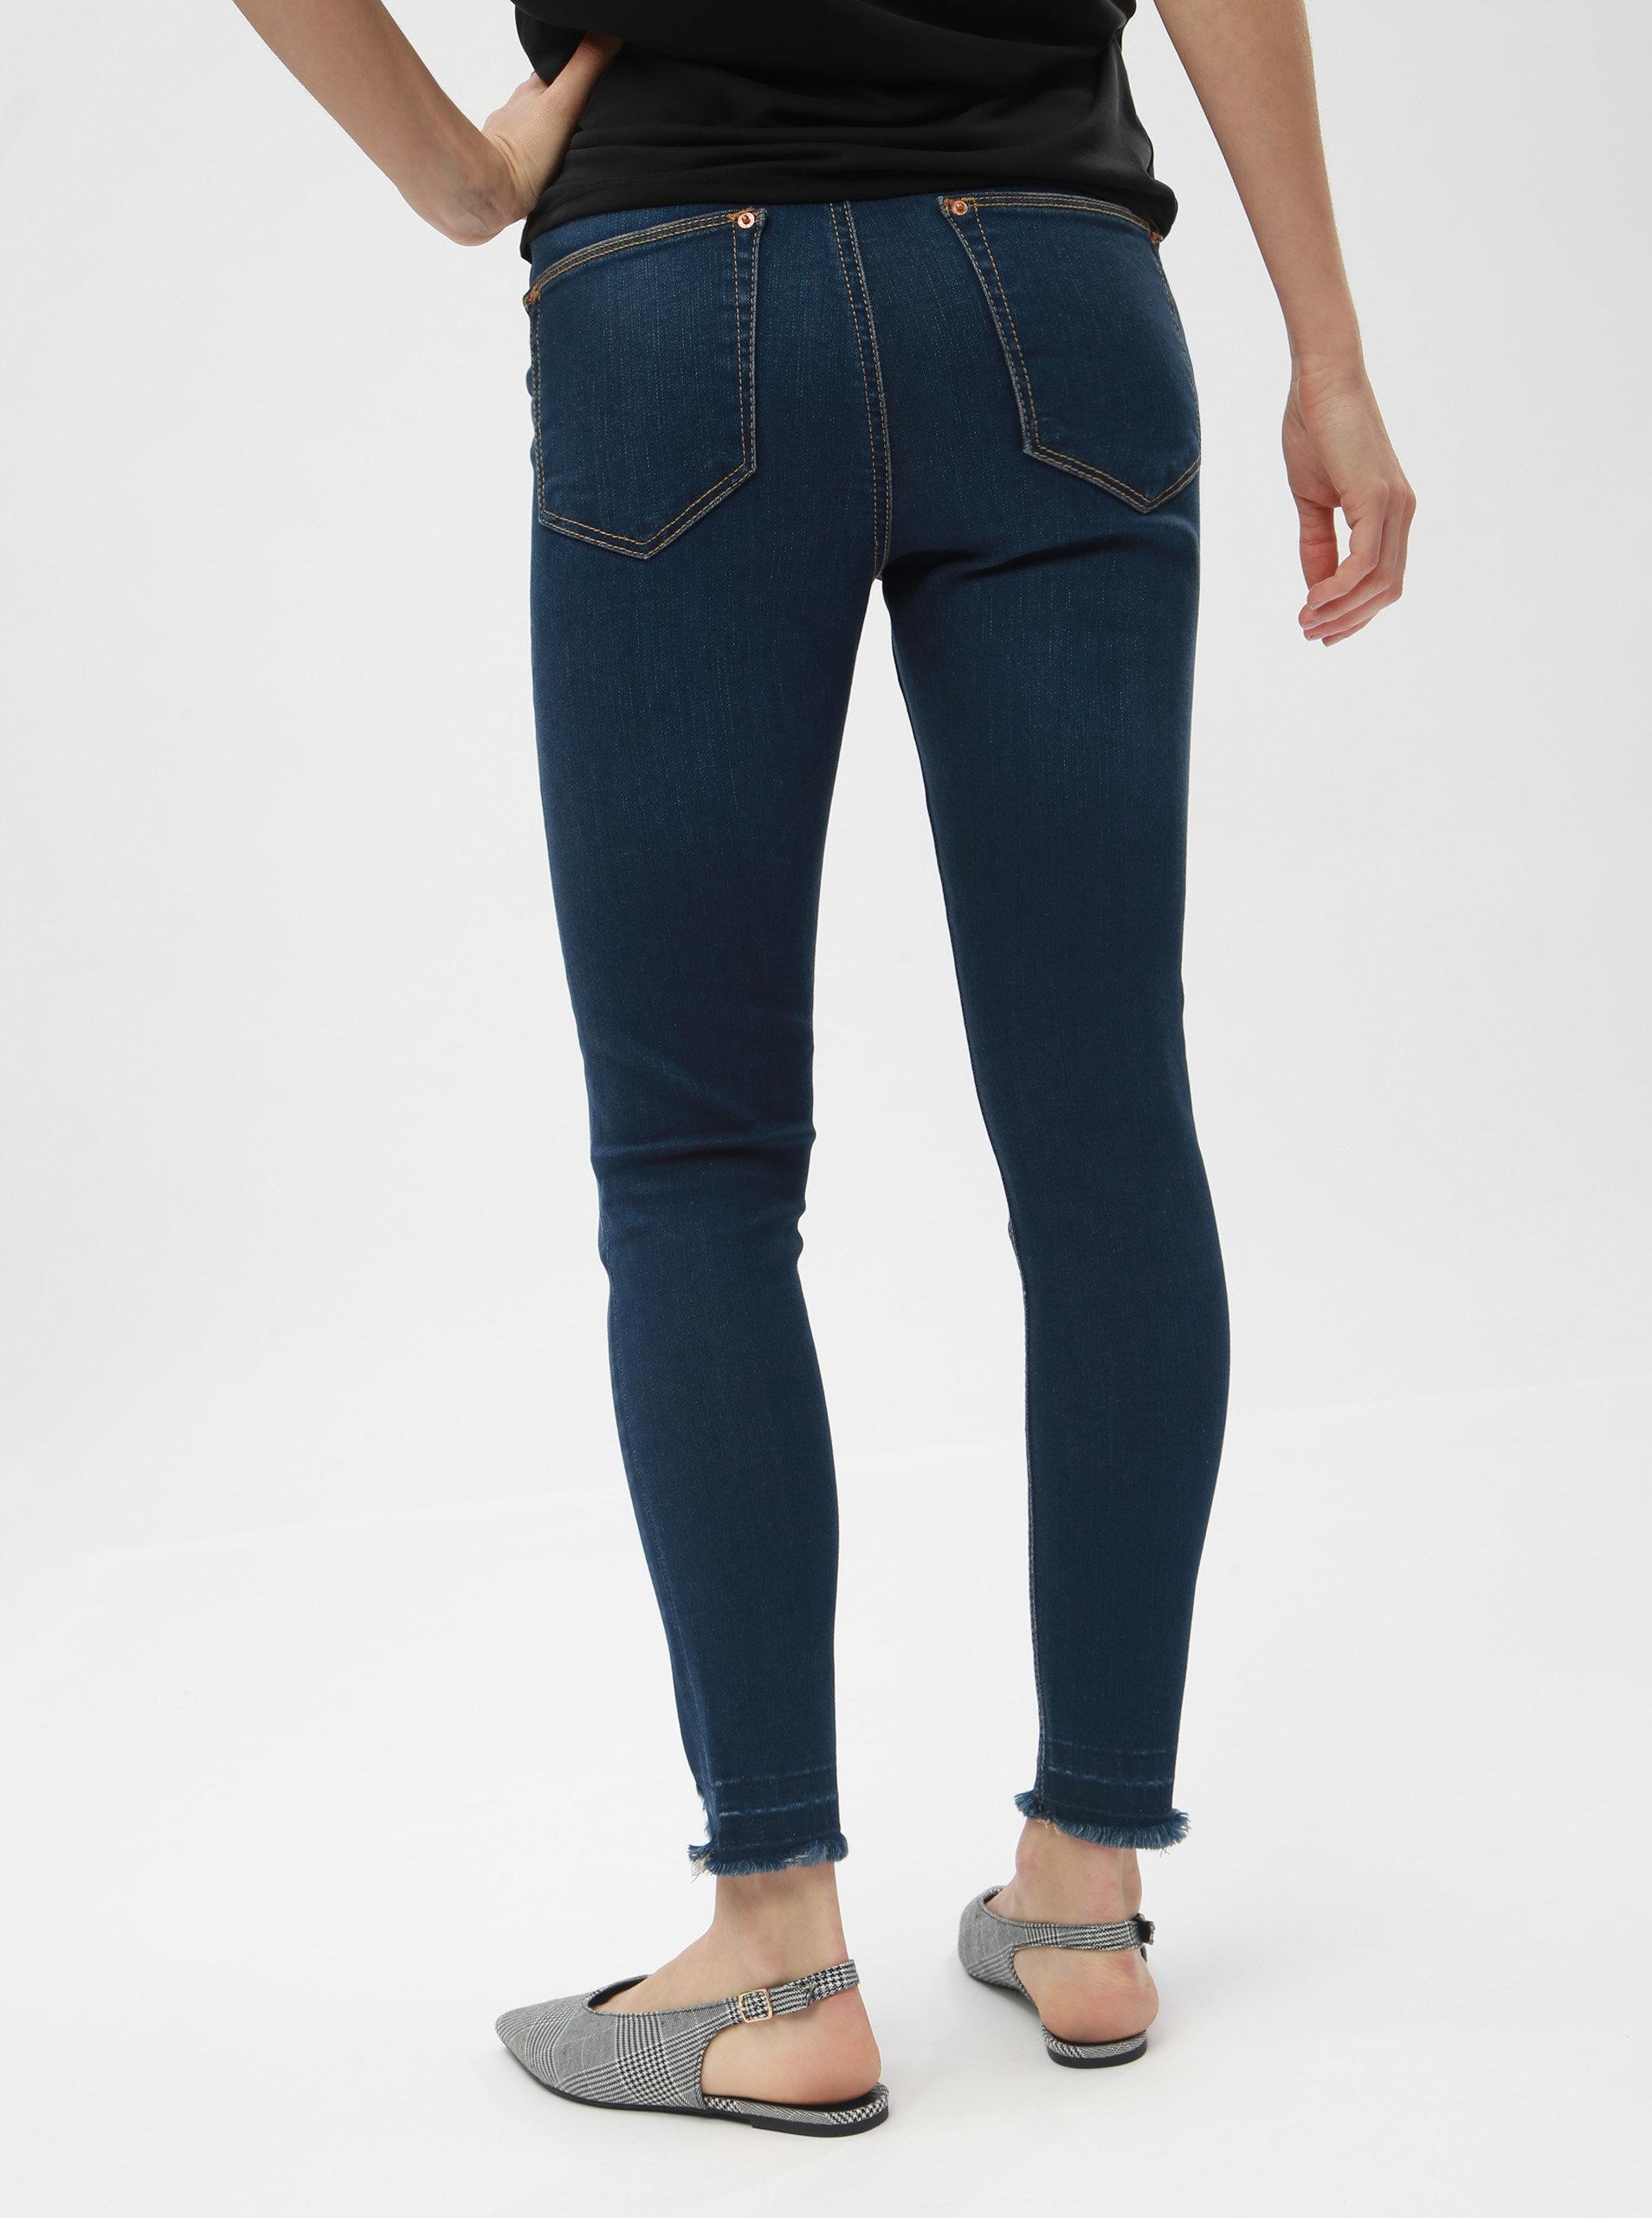 633a9a8d5a5 Modré super skinny džíny s potrhaným efektem Miss Selfridge Petites Lizzie  ...